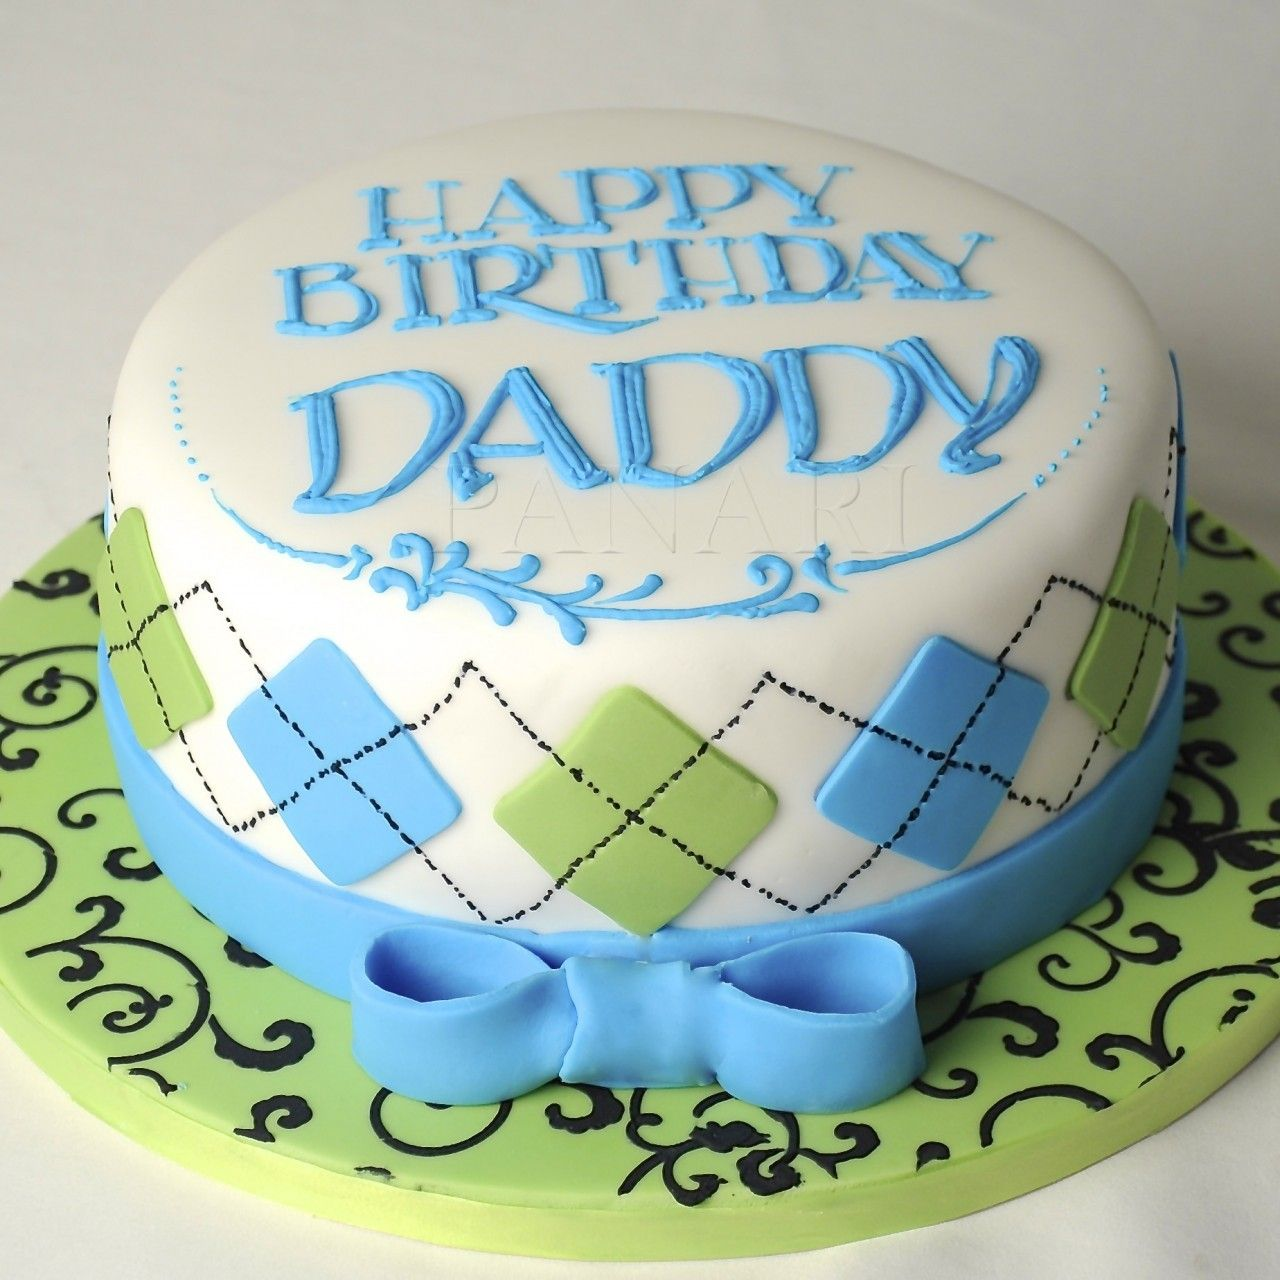 Birthday Cakes For Men 10g 12801280 Cake Decorating